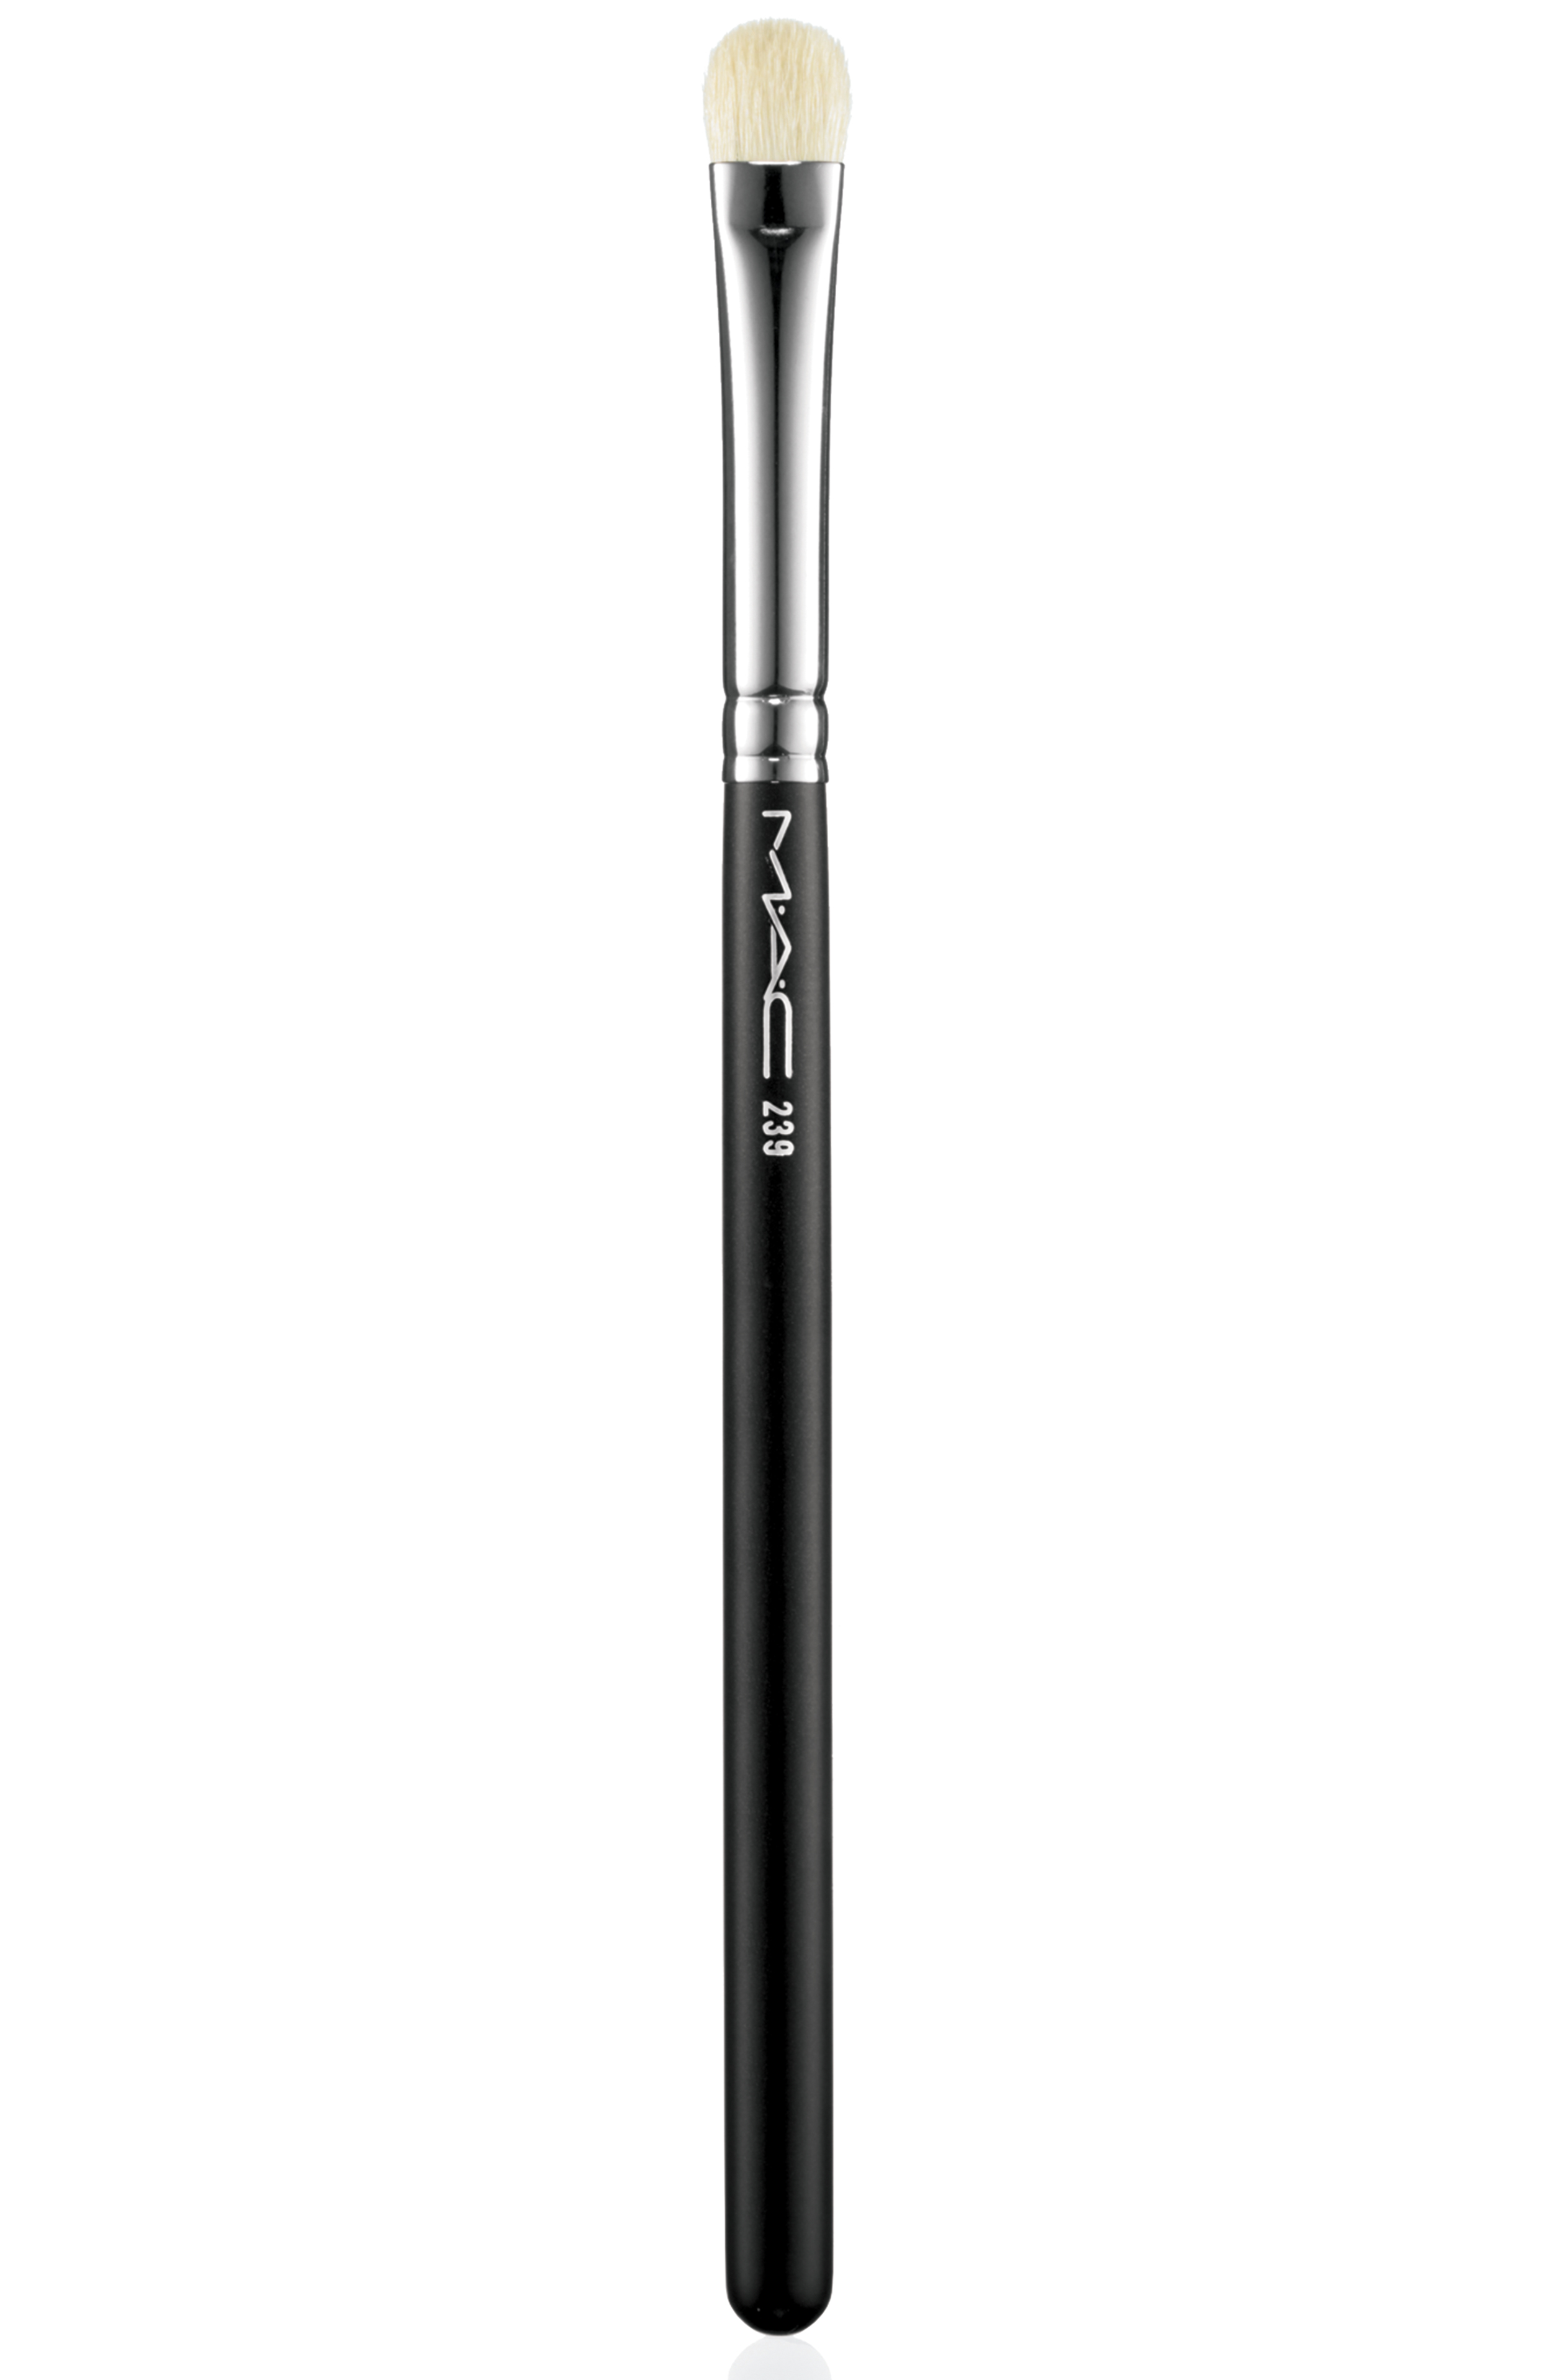 mac moody blooms brush  eye shader slika 06 MAC Cosmetics: Nova kolekcija Moody Blooms